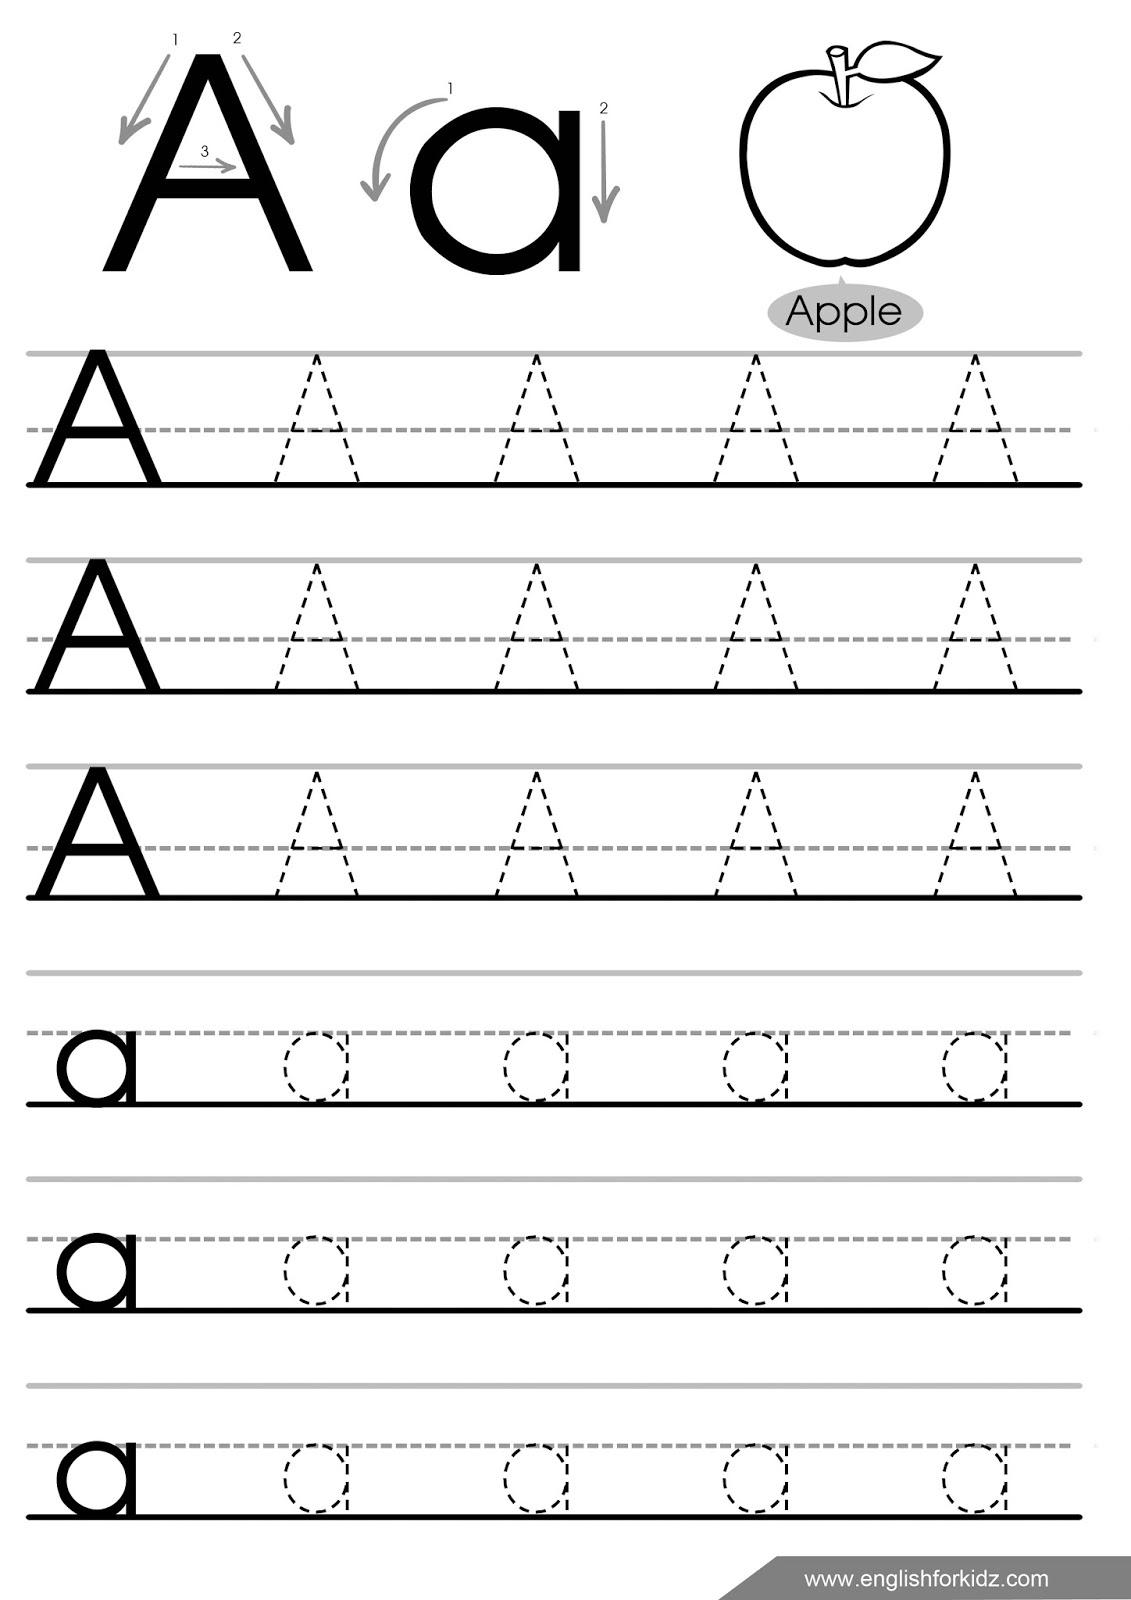 Preschool Tracing Worksheets Letters